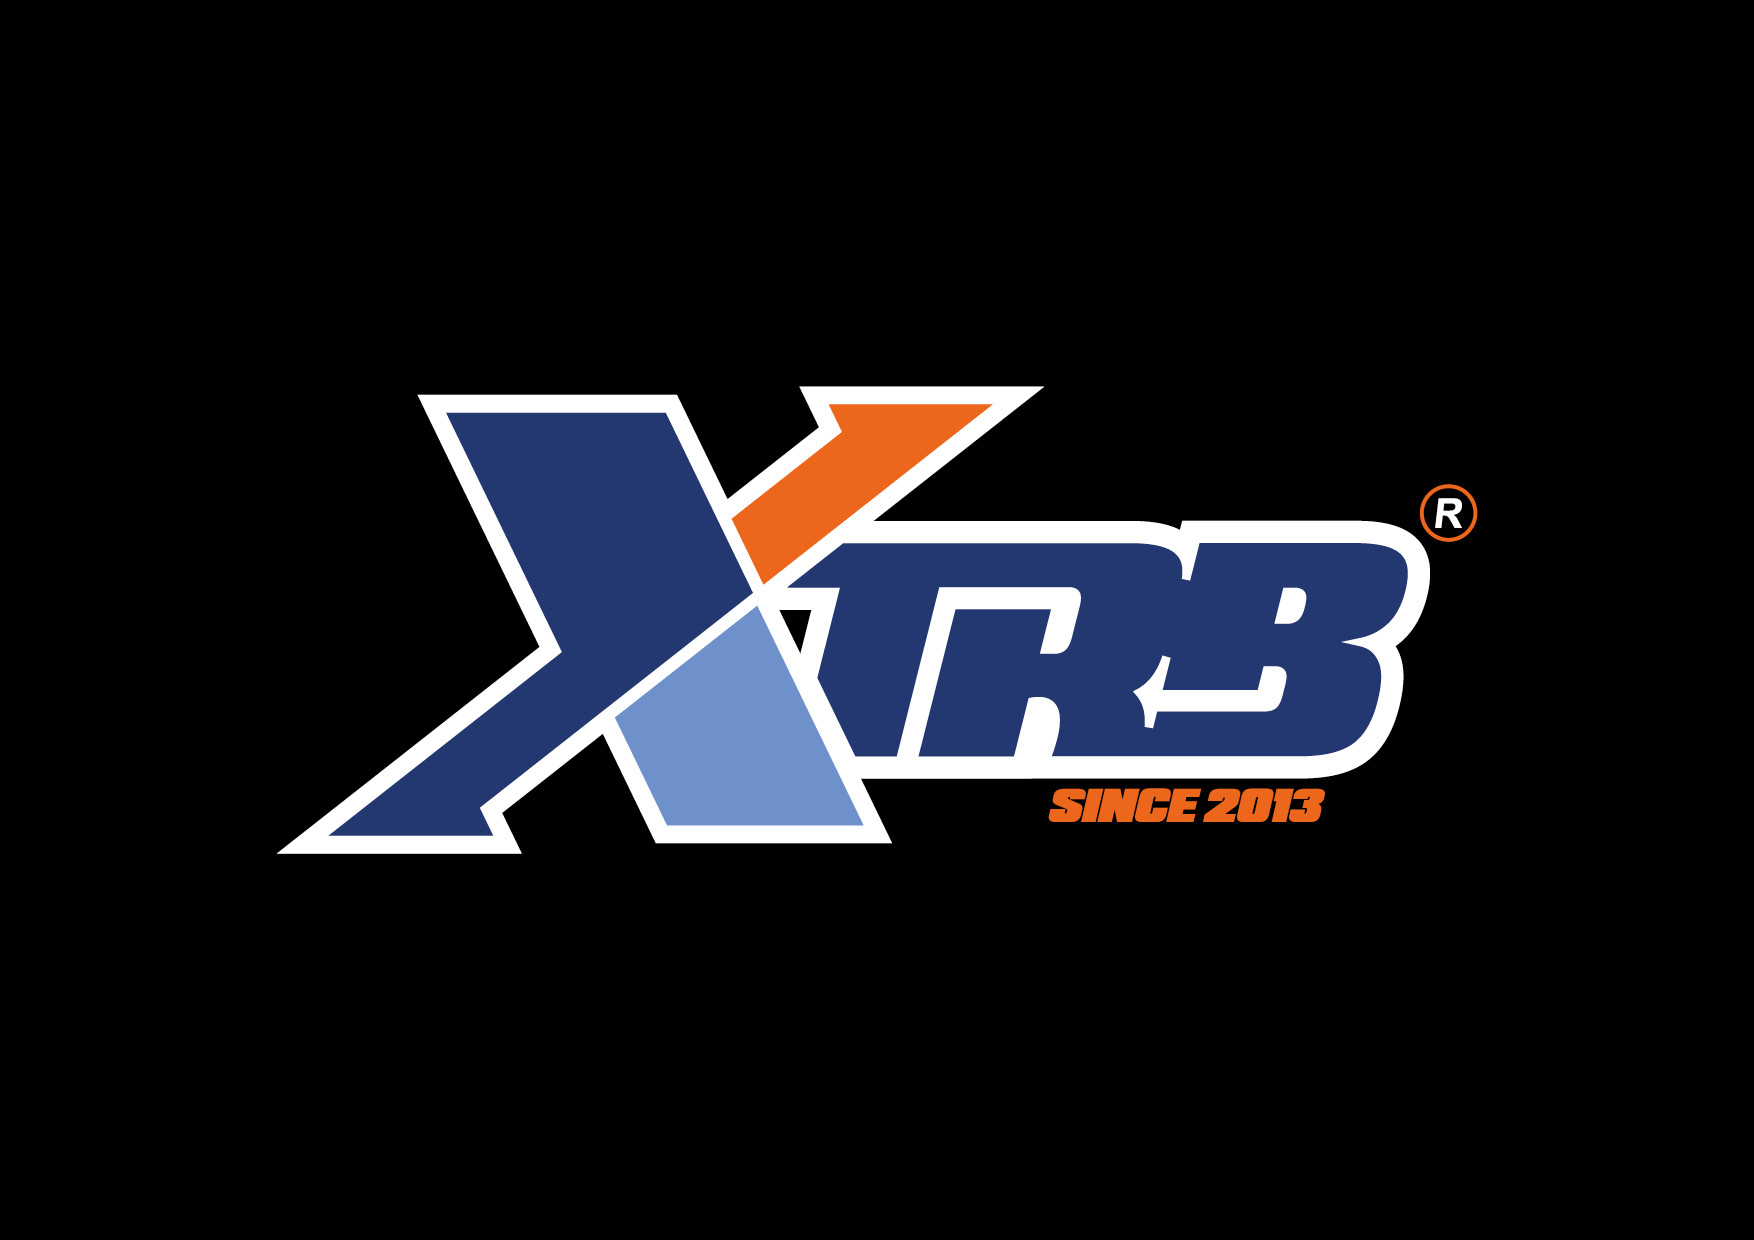 XTRB SINCE 2013